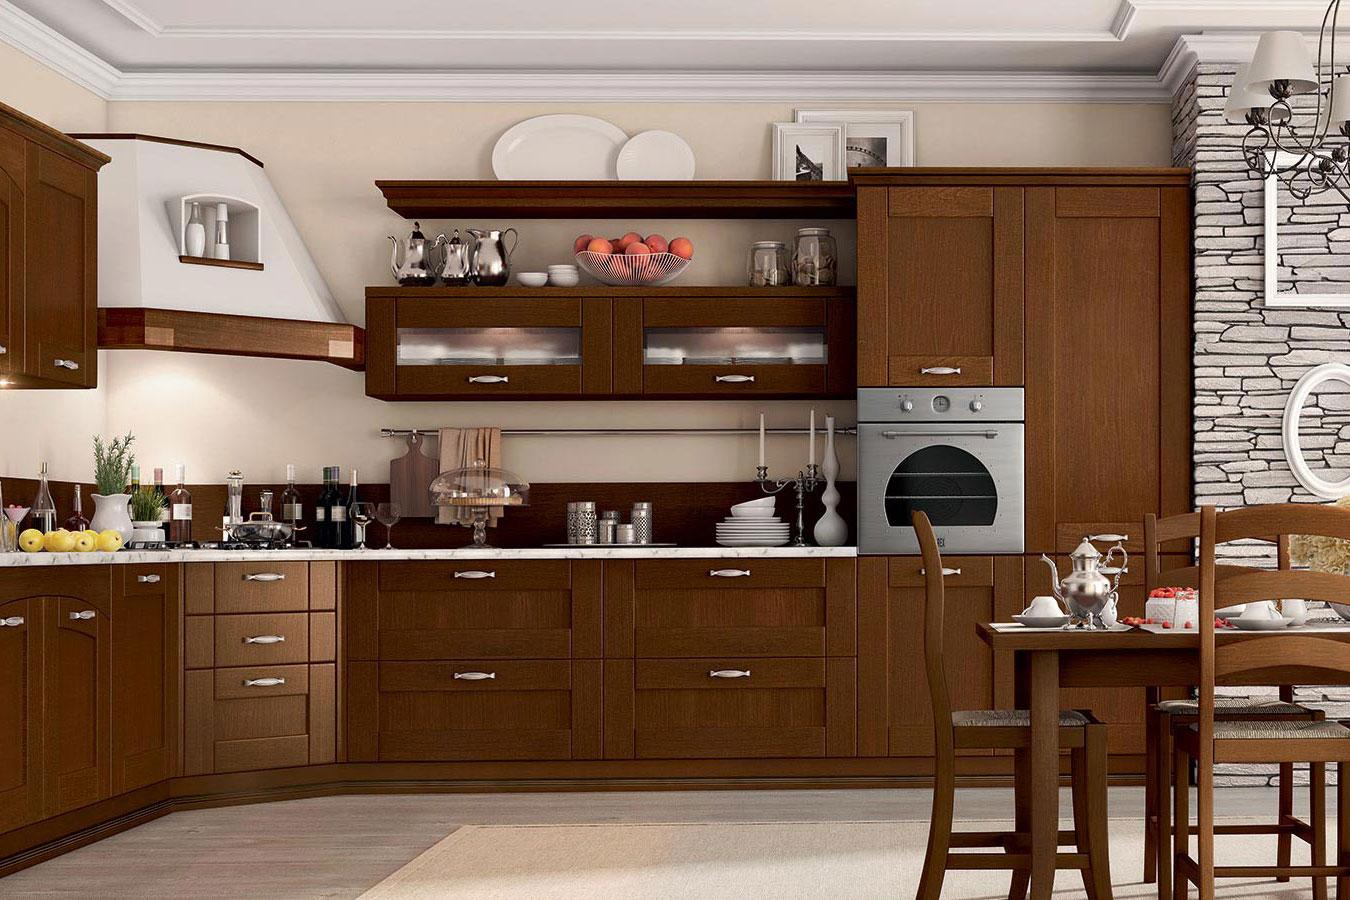 Awesome arredo cucina classica pictures ideas design for Visma arredo 3